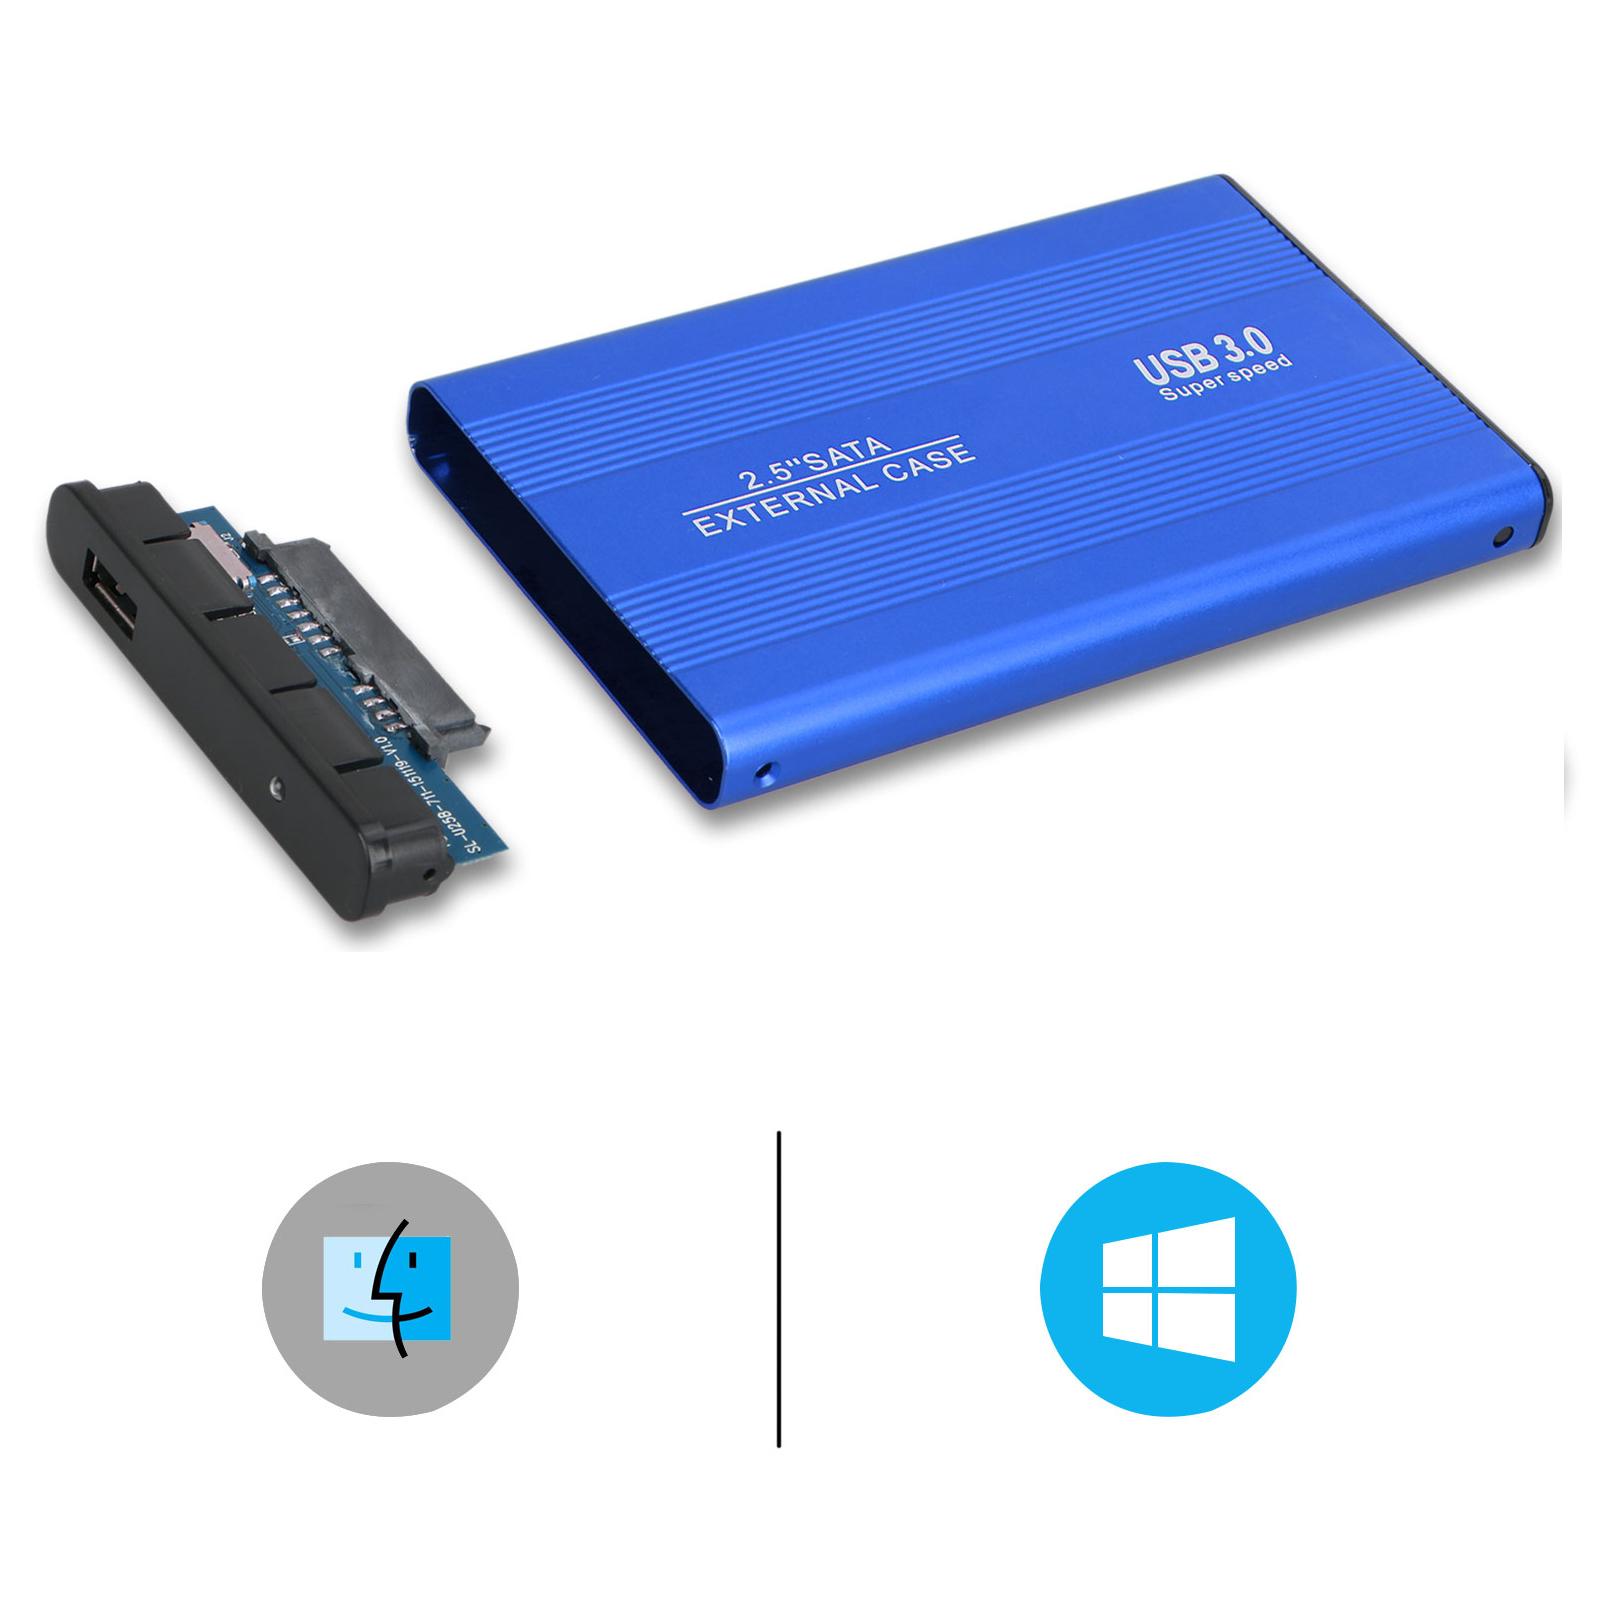 EEEKit Portable External Hard Drive Enclosure Adapter USB 3.0 to SATA Hard Disk Case Housing for 2.5 Inch